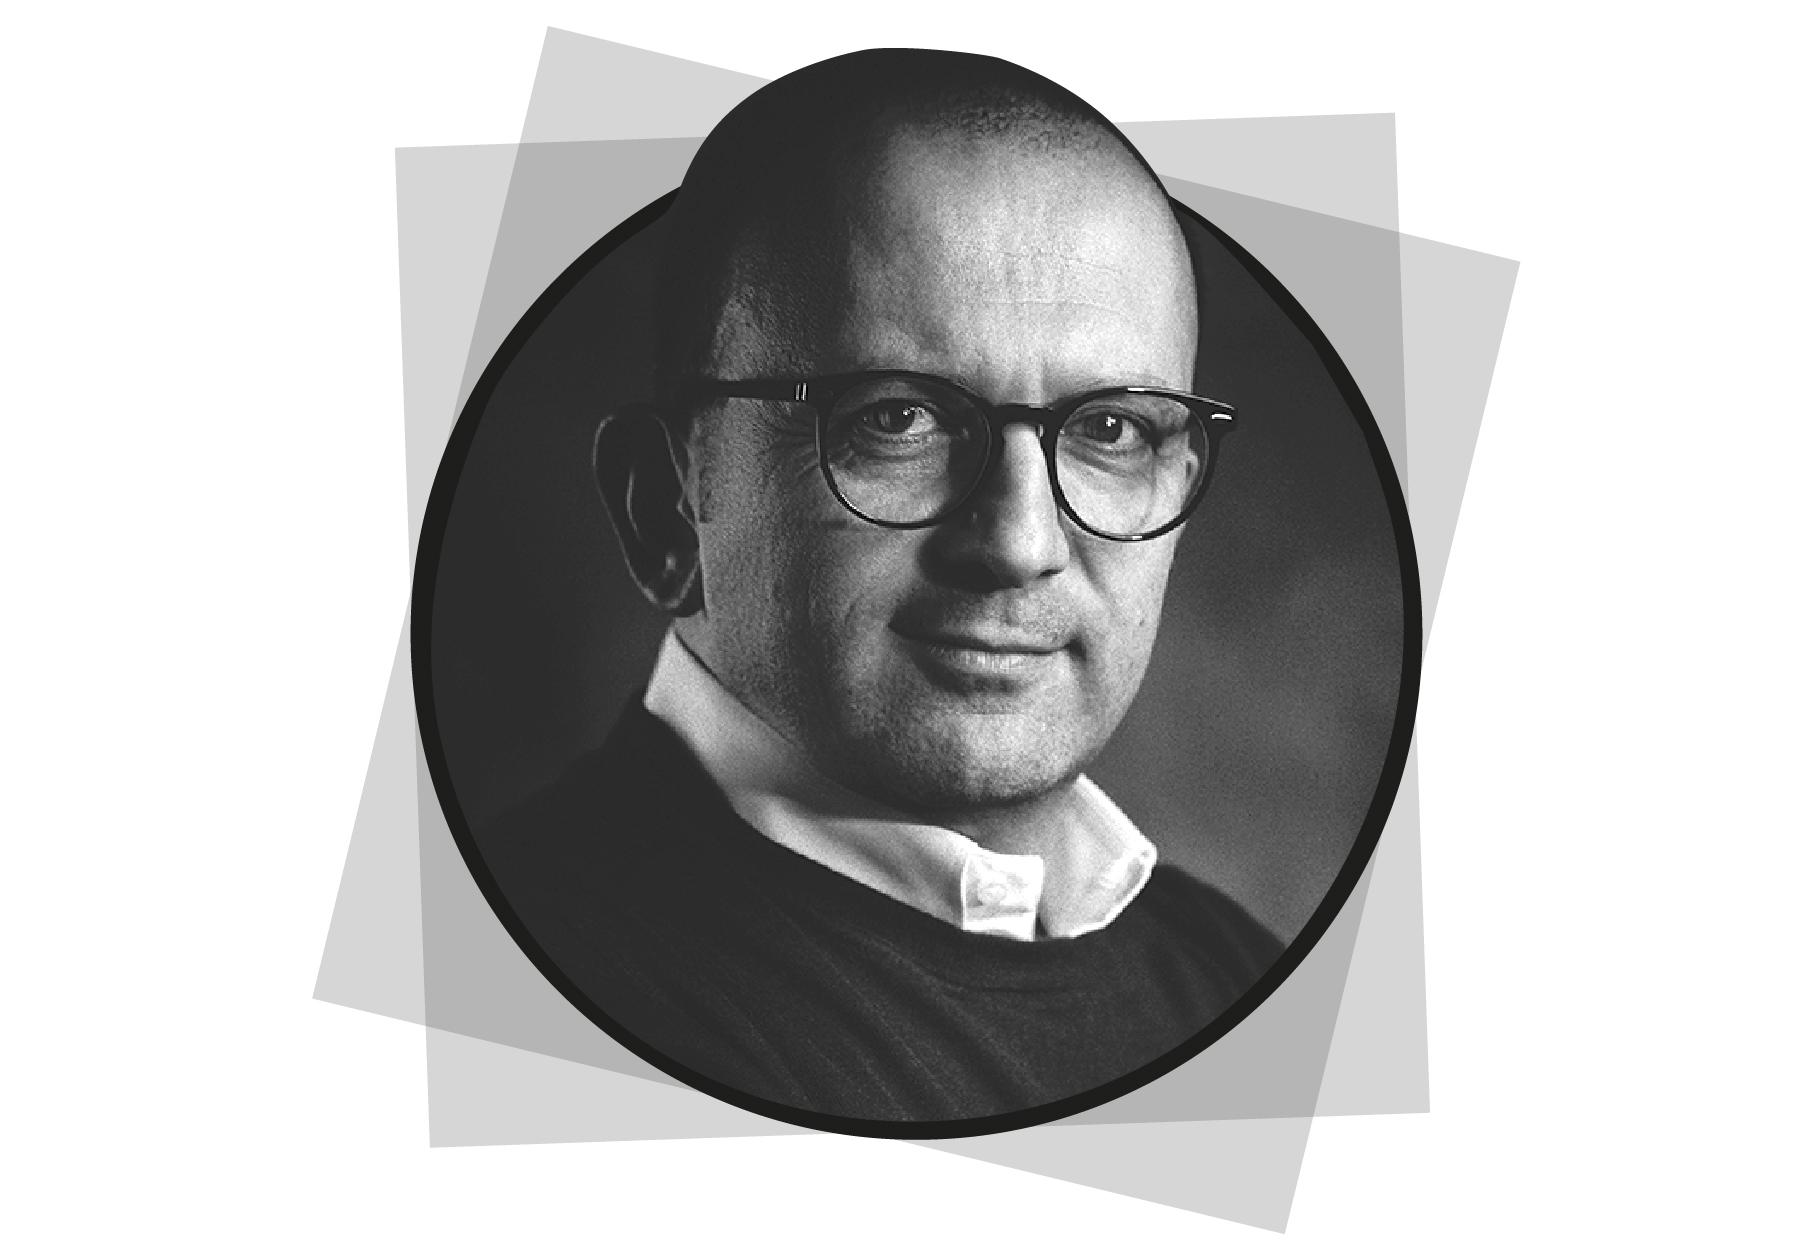 ARCH. Paolo Pampanoni